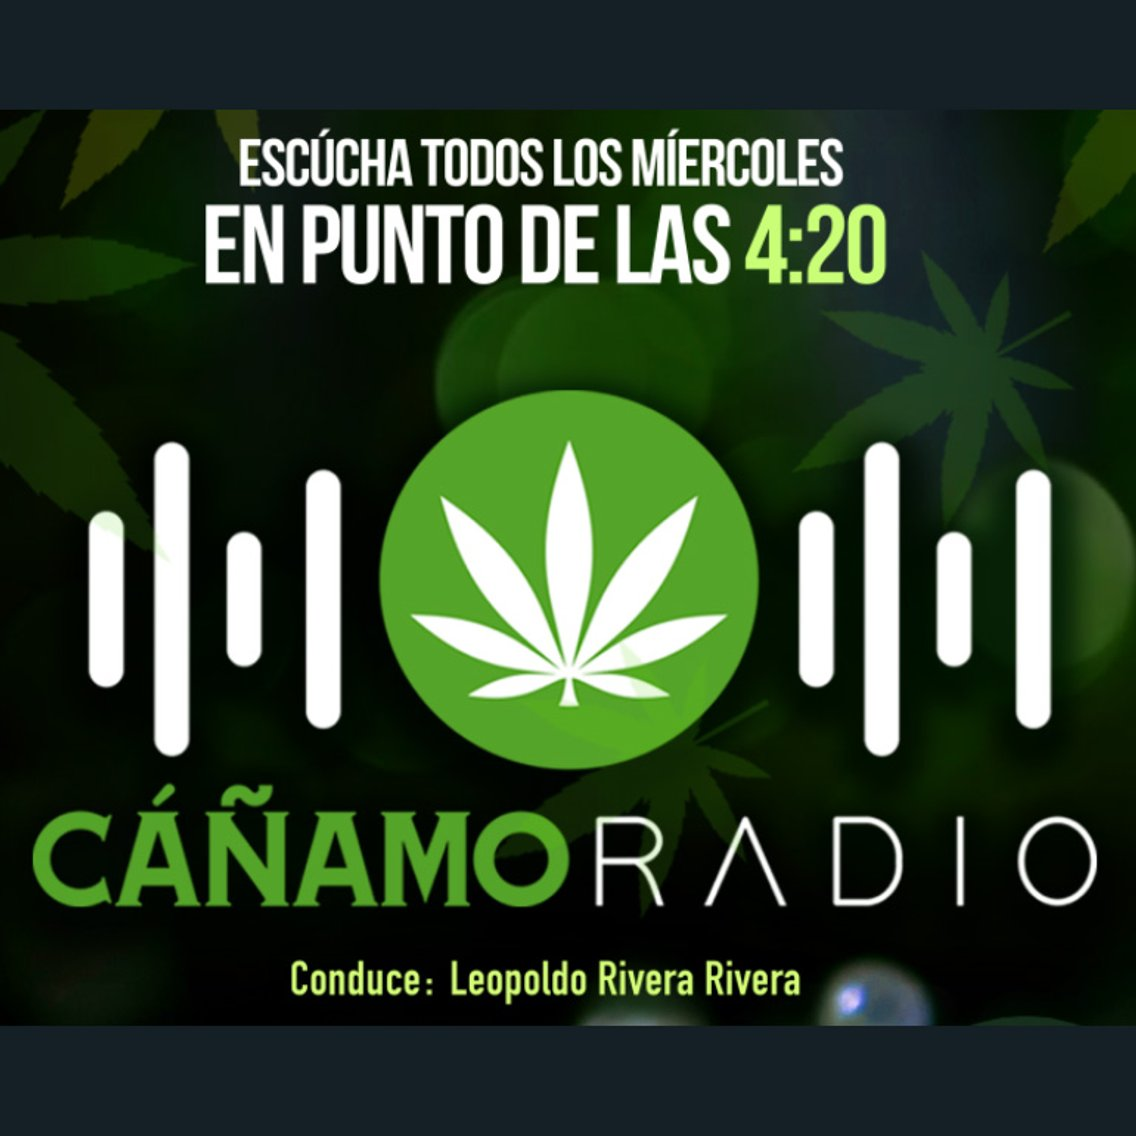 CANAMORadio - Cover Image